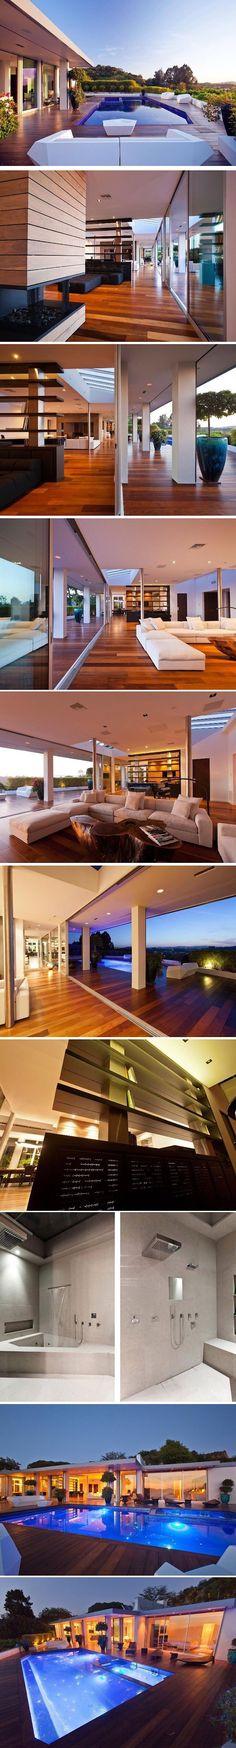 House in Beverly Hills by Jendretzki #BeverlyHills #LosAngelest #Luxury #RealEstate #HomeListings